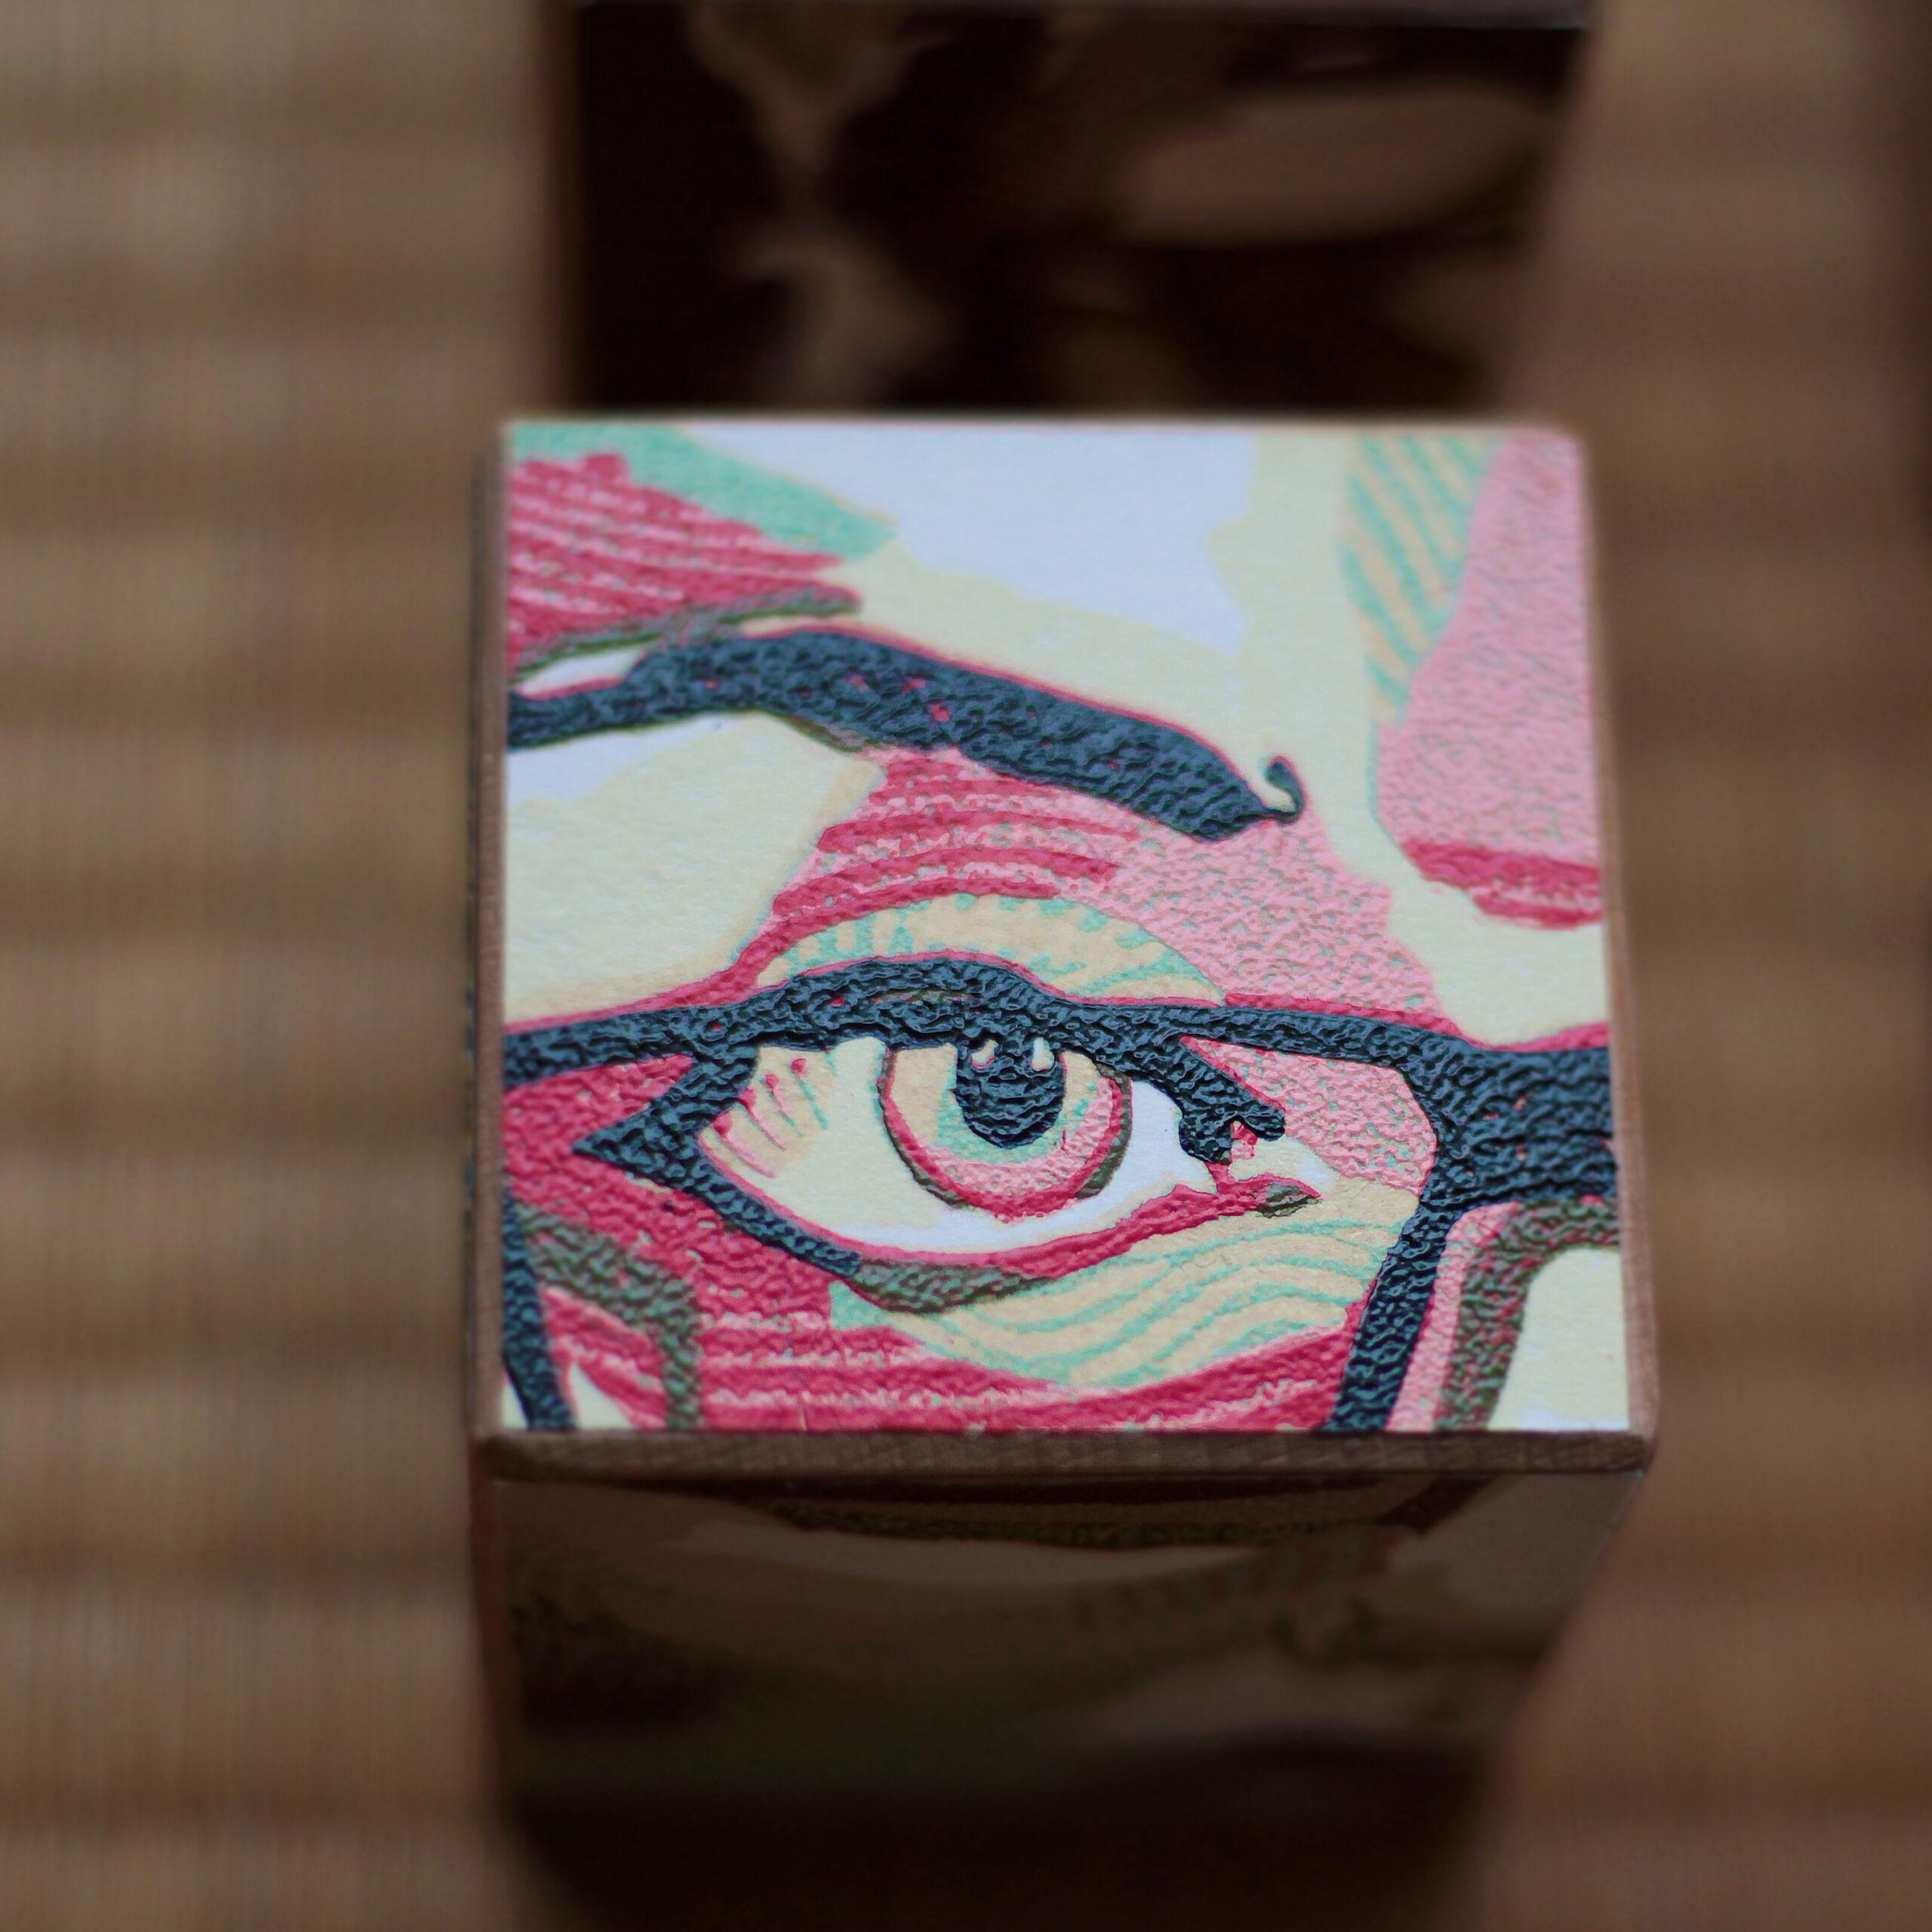 Linocut print on cube object